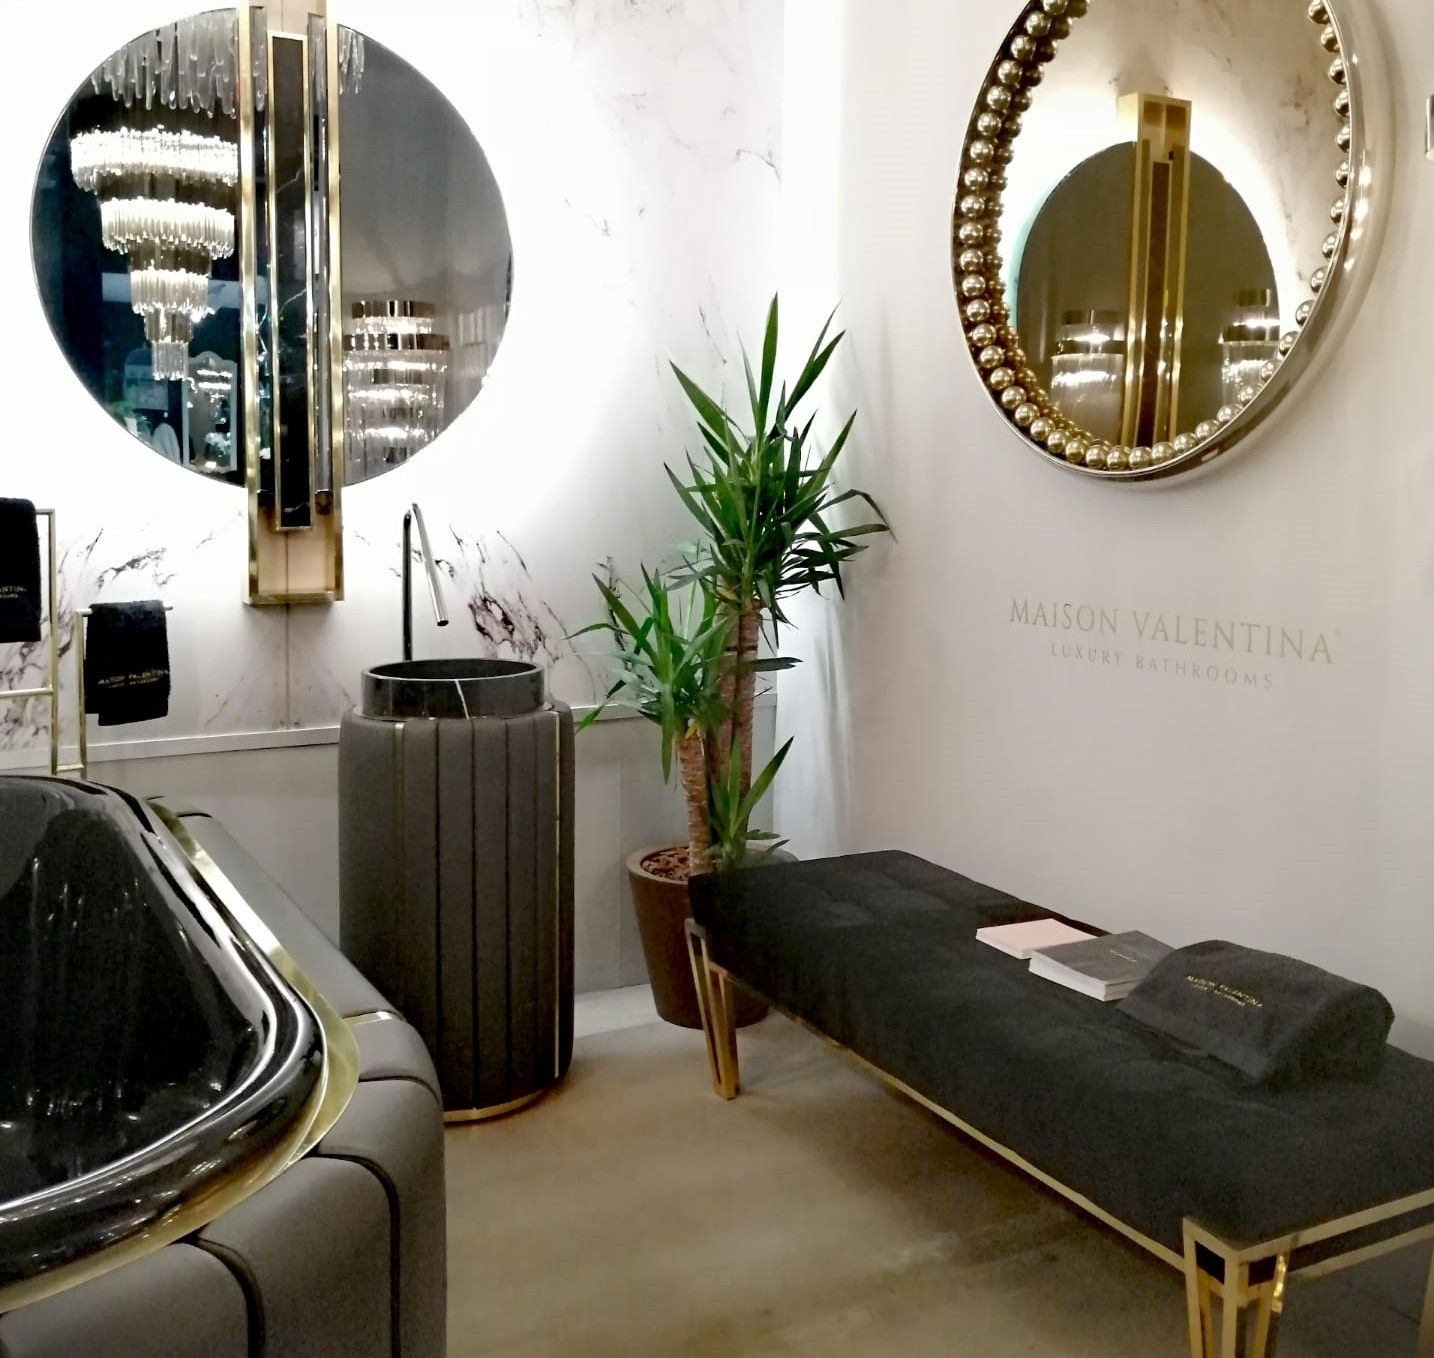 hábitat valencia 2019 Amazing Bathroom Design Inspirations From Hábitat Valencia 2019 luxxu stand valencia 2